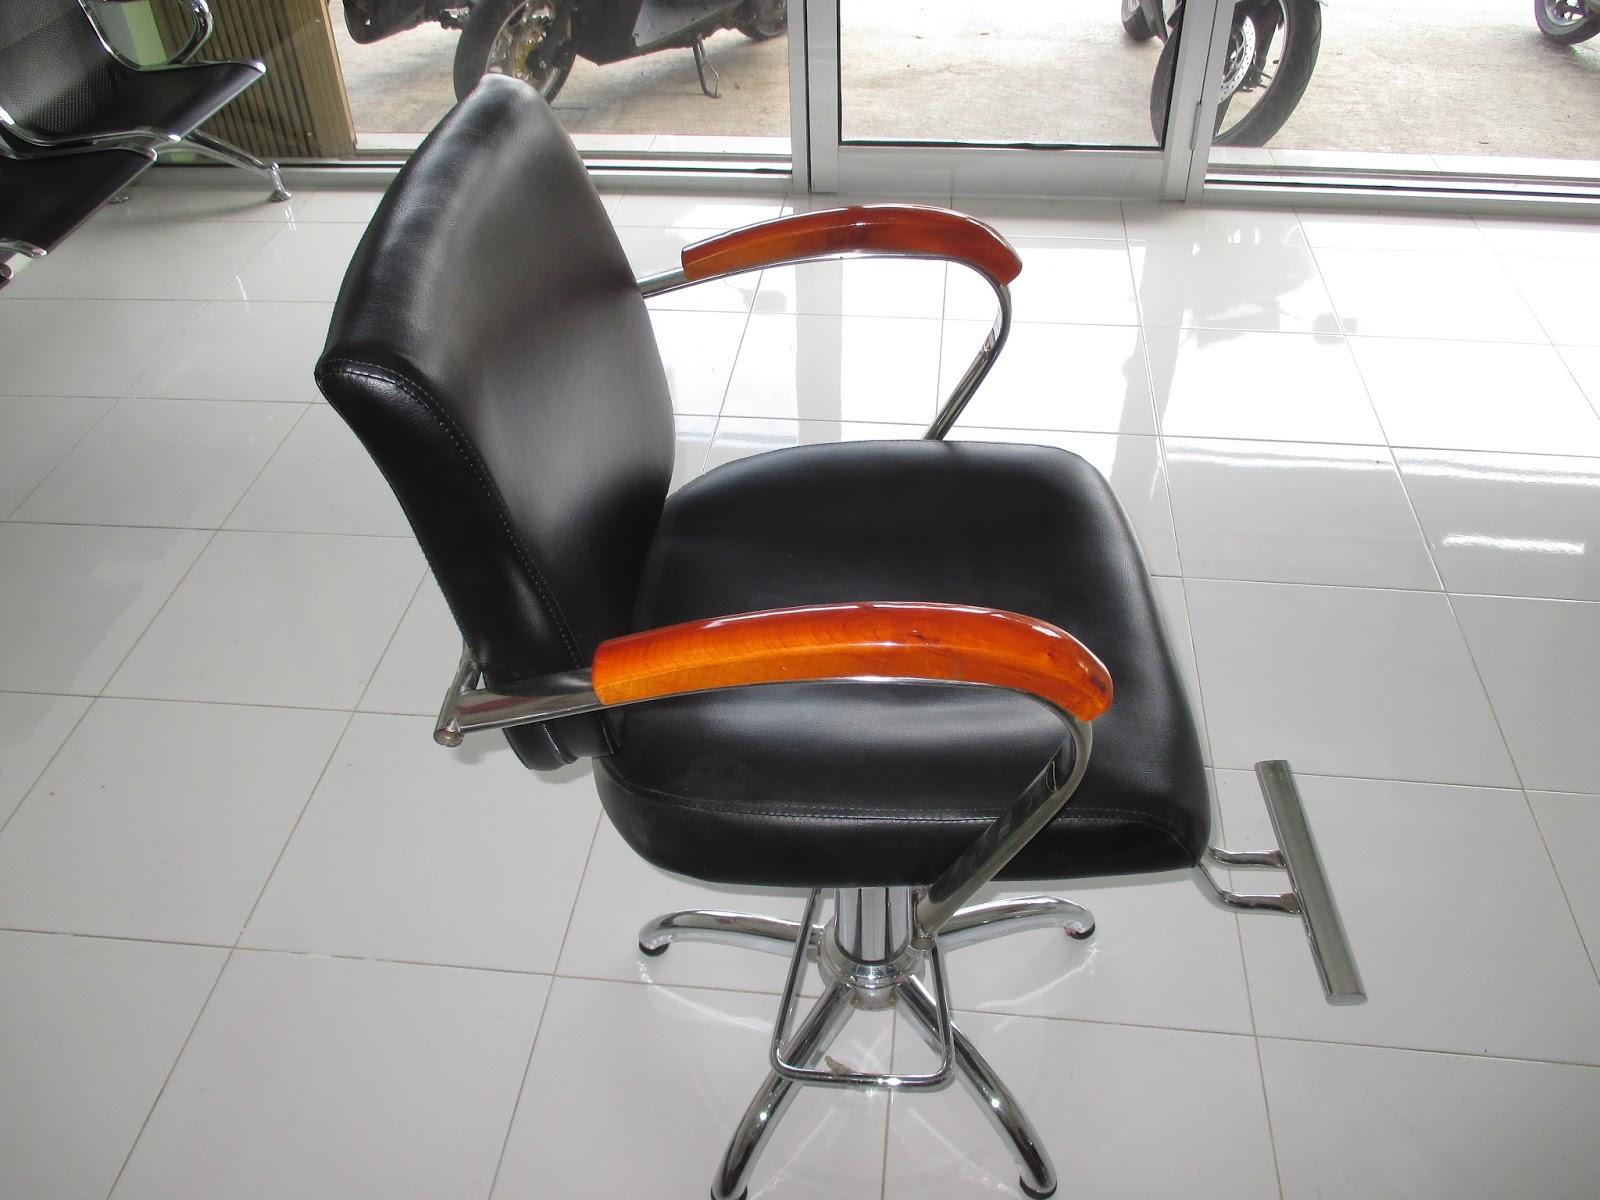 kursus potong rambut surabaya 087739076675